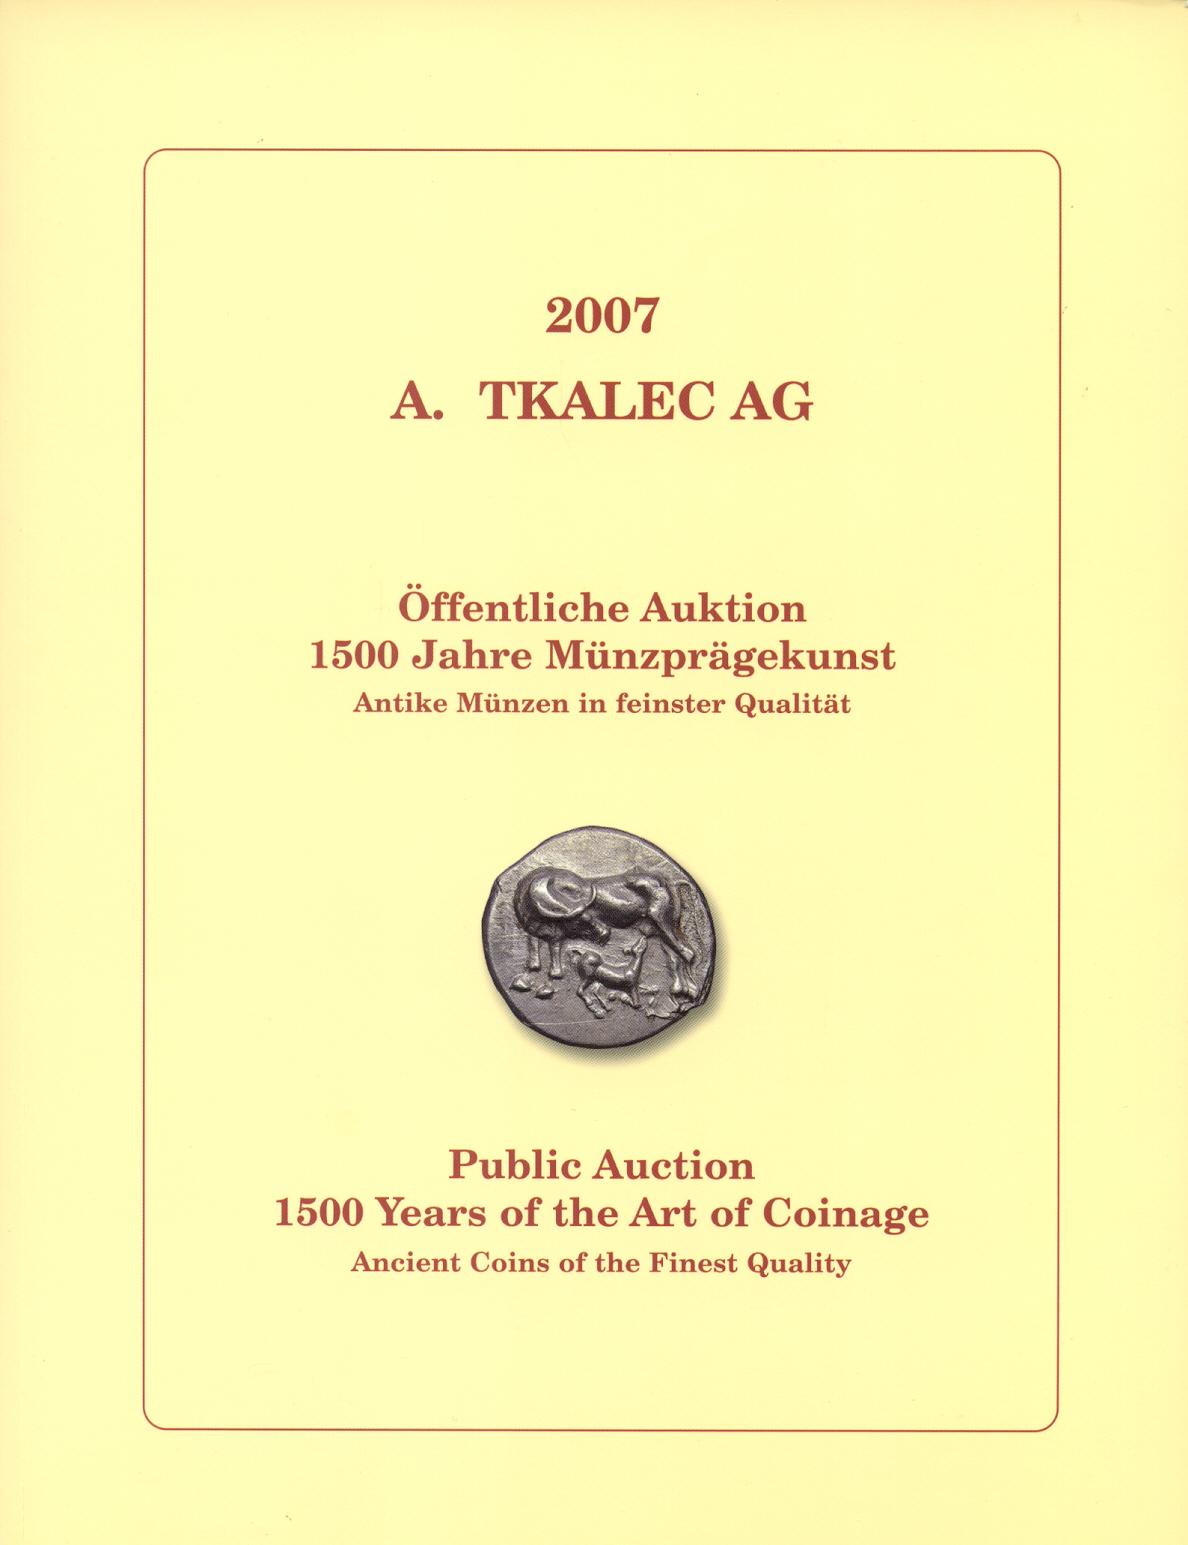 2007 AUCTION CATALOGUES MÜNZAUKTION TKALEC - KATALOG 2007: 1500 JAHRE MÜNZPRÄGEKUNST neuwertig